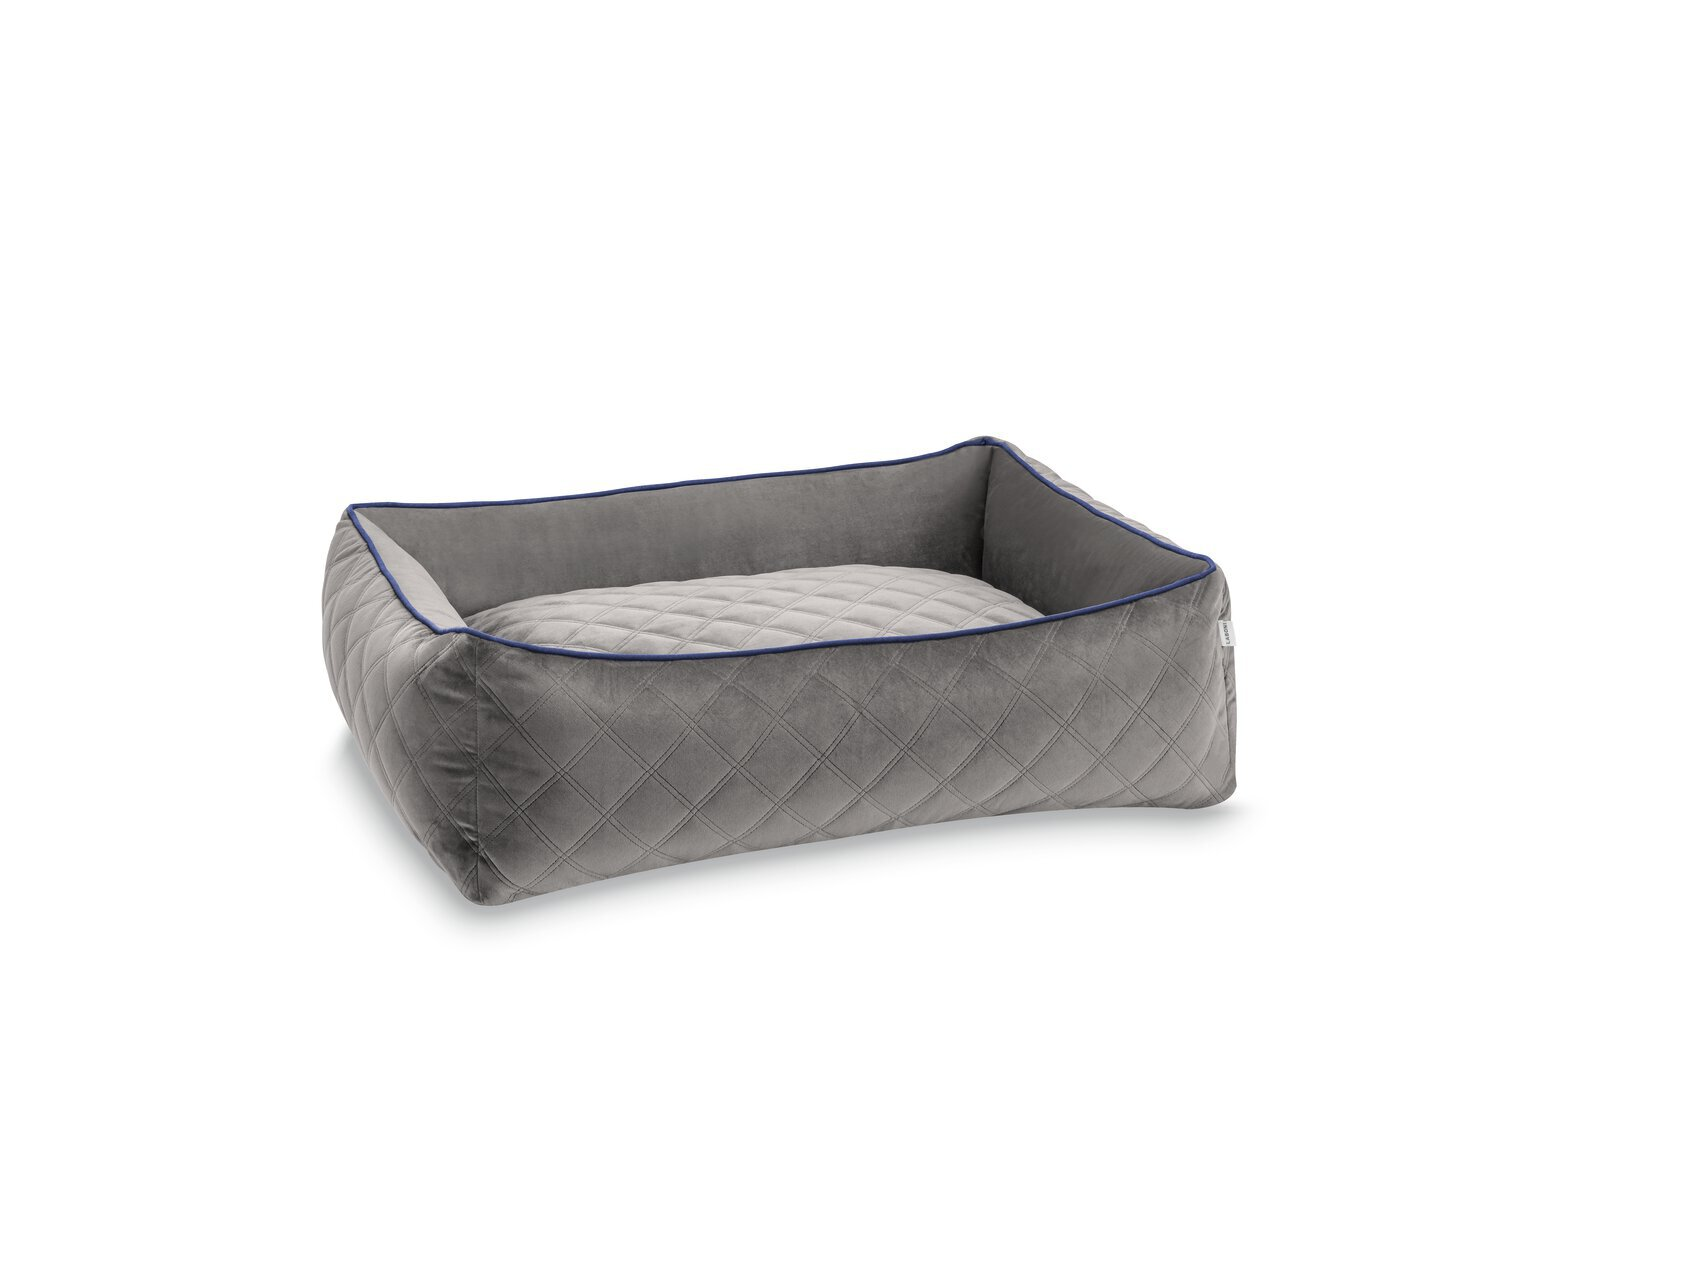 CLASSIC Hundebett S OXFORD - Grey